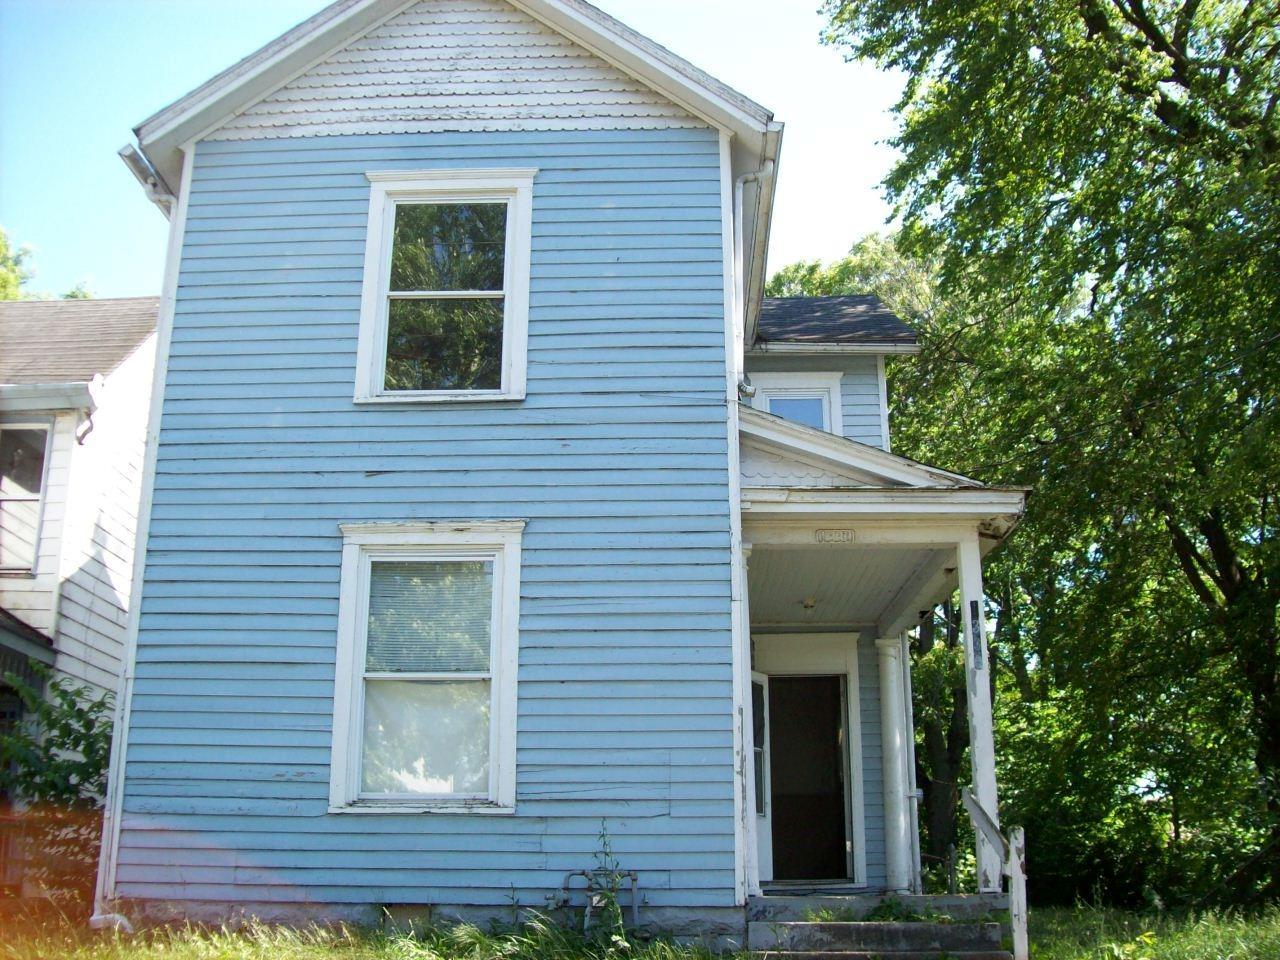 1330 Fairmount Avenue, Middletown, Ohio 45044, 4 Bedrooms Bedrooms, 6 Rooms Rooms,1 BathroomBathrooms,Single Family Residence,For Sale,Fairmount,1704447